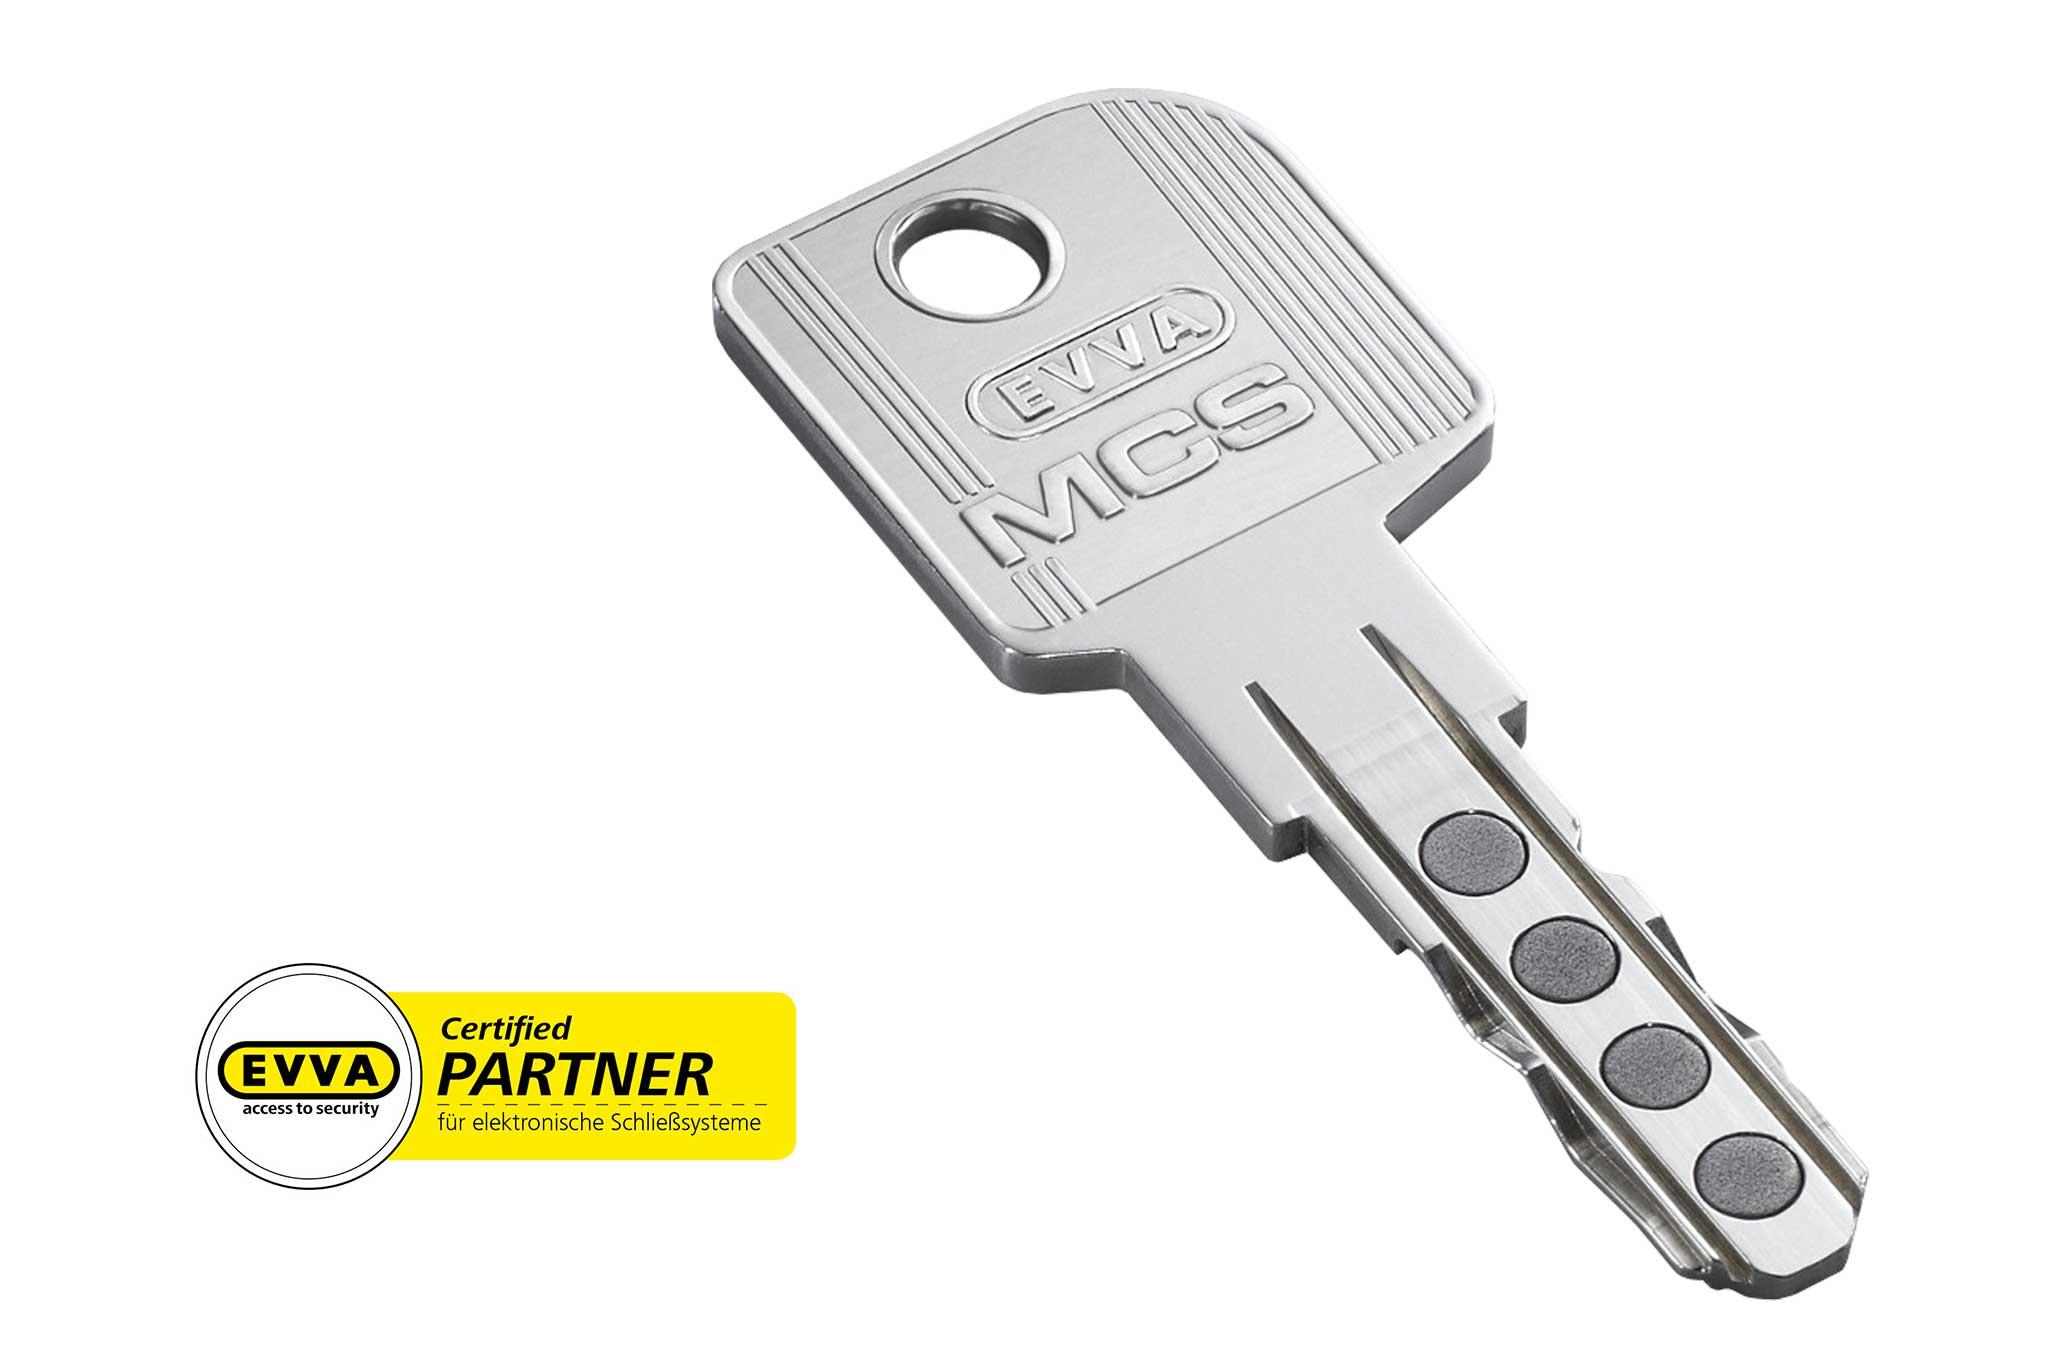 Kljuc-MCS-magnetni-sistem-zakljucavanja